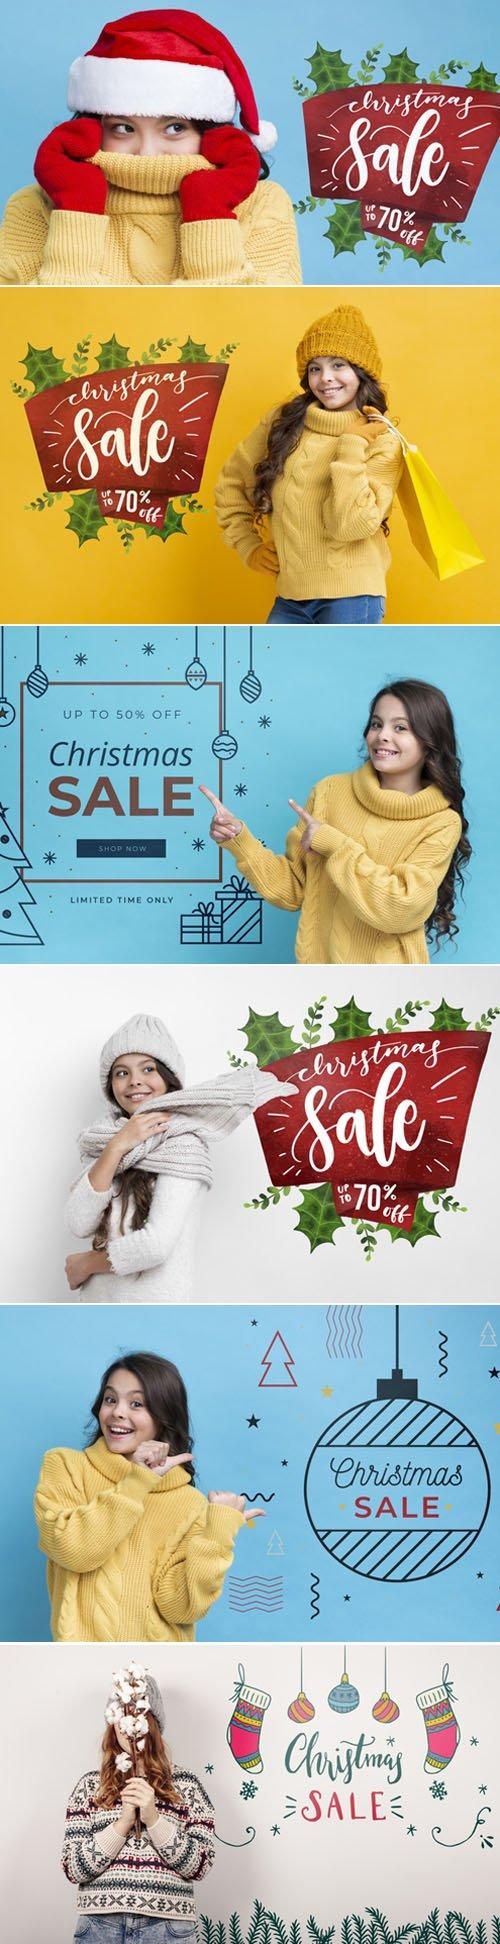 Holiday Sales PSD Mockups Templates 2